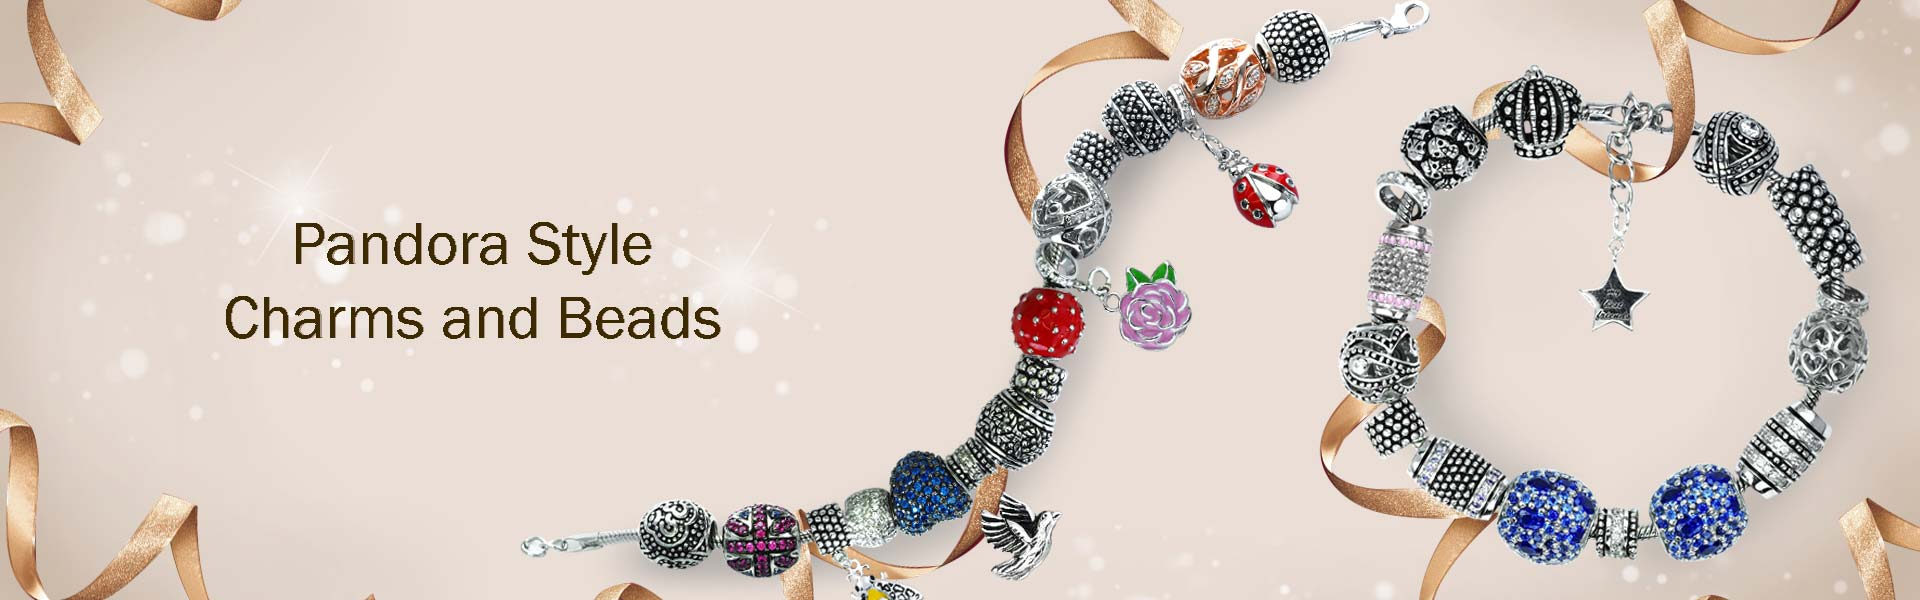 pandora style charms and beads